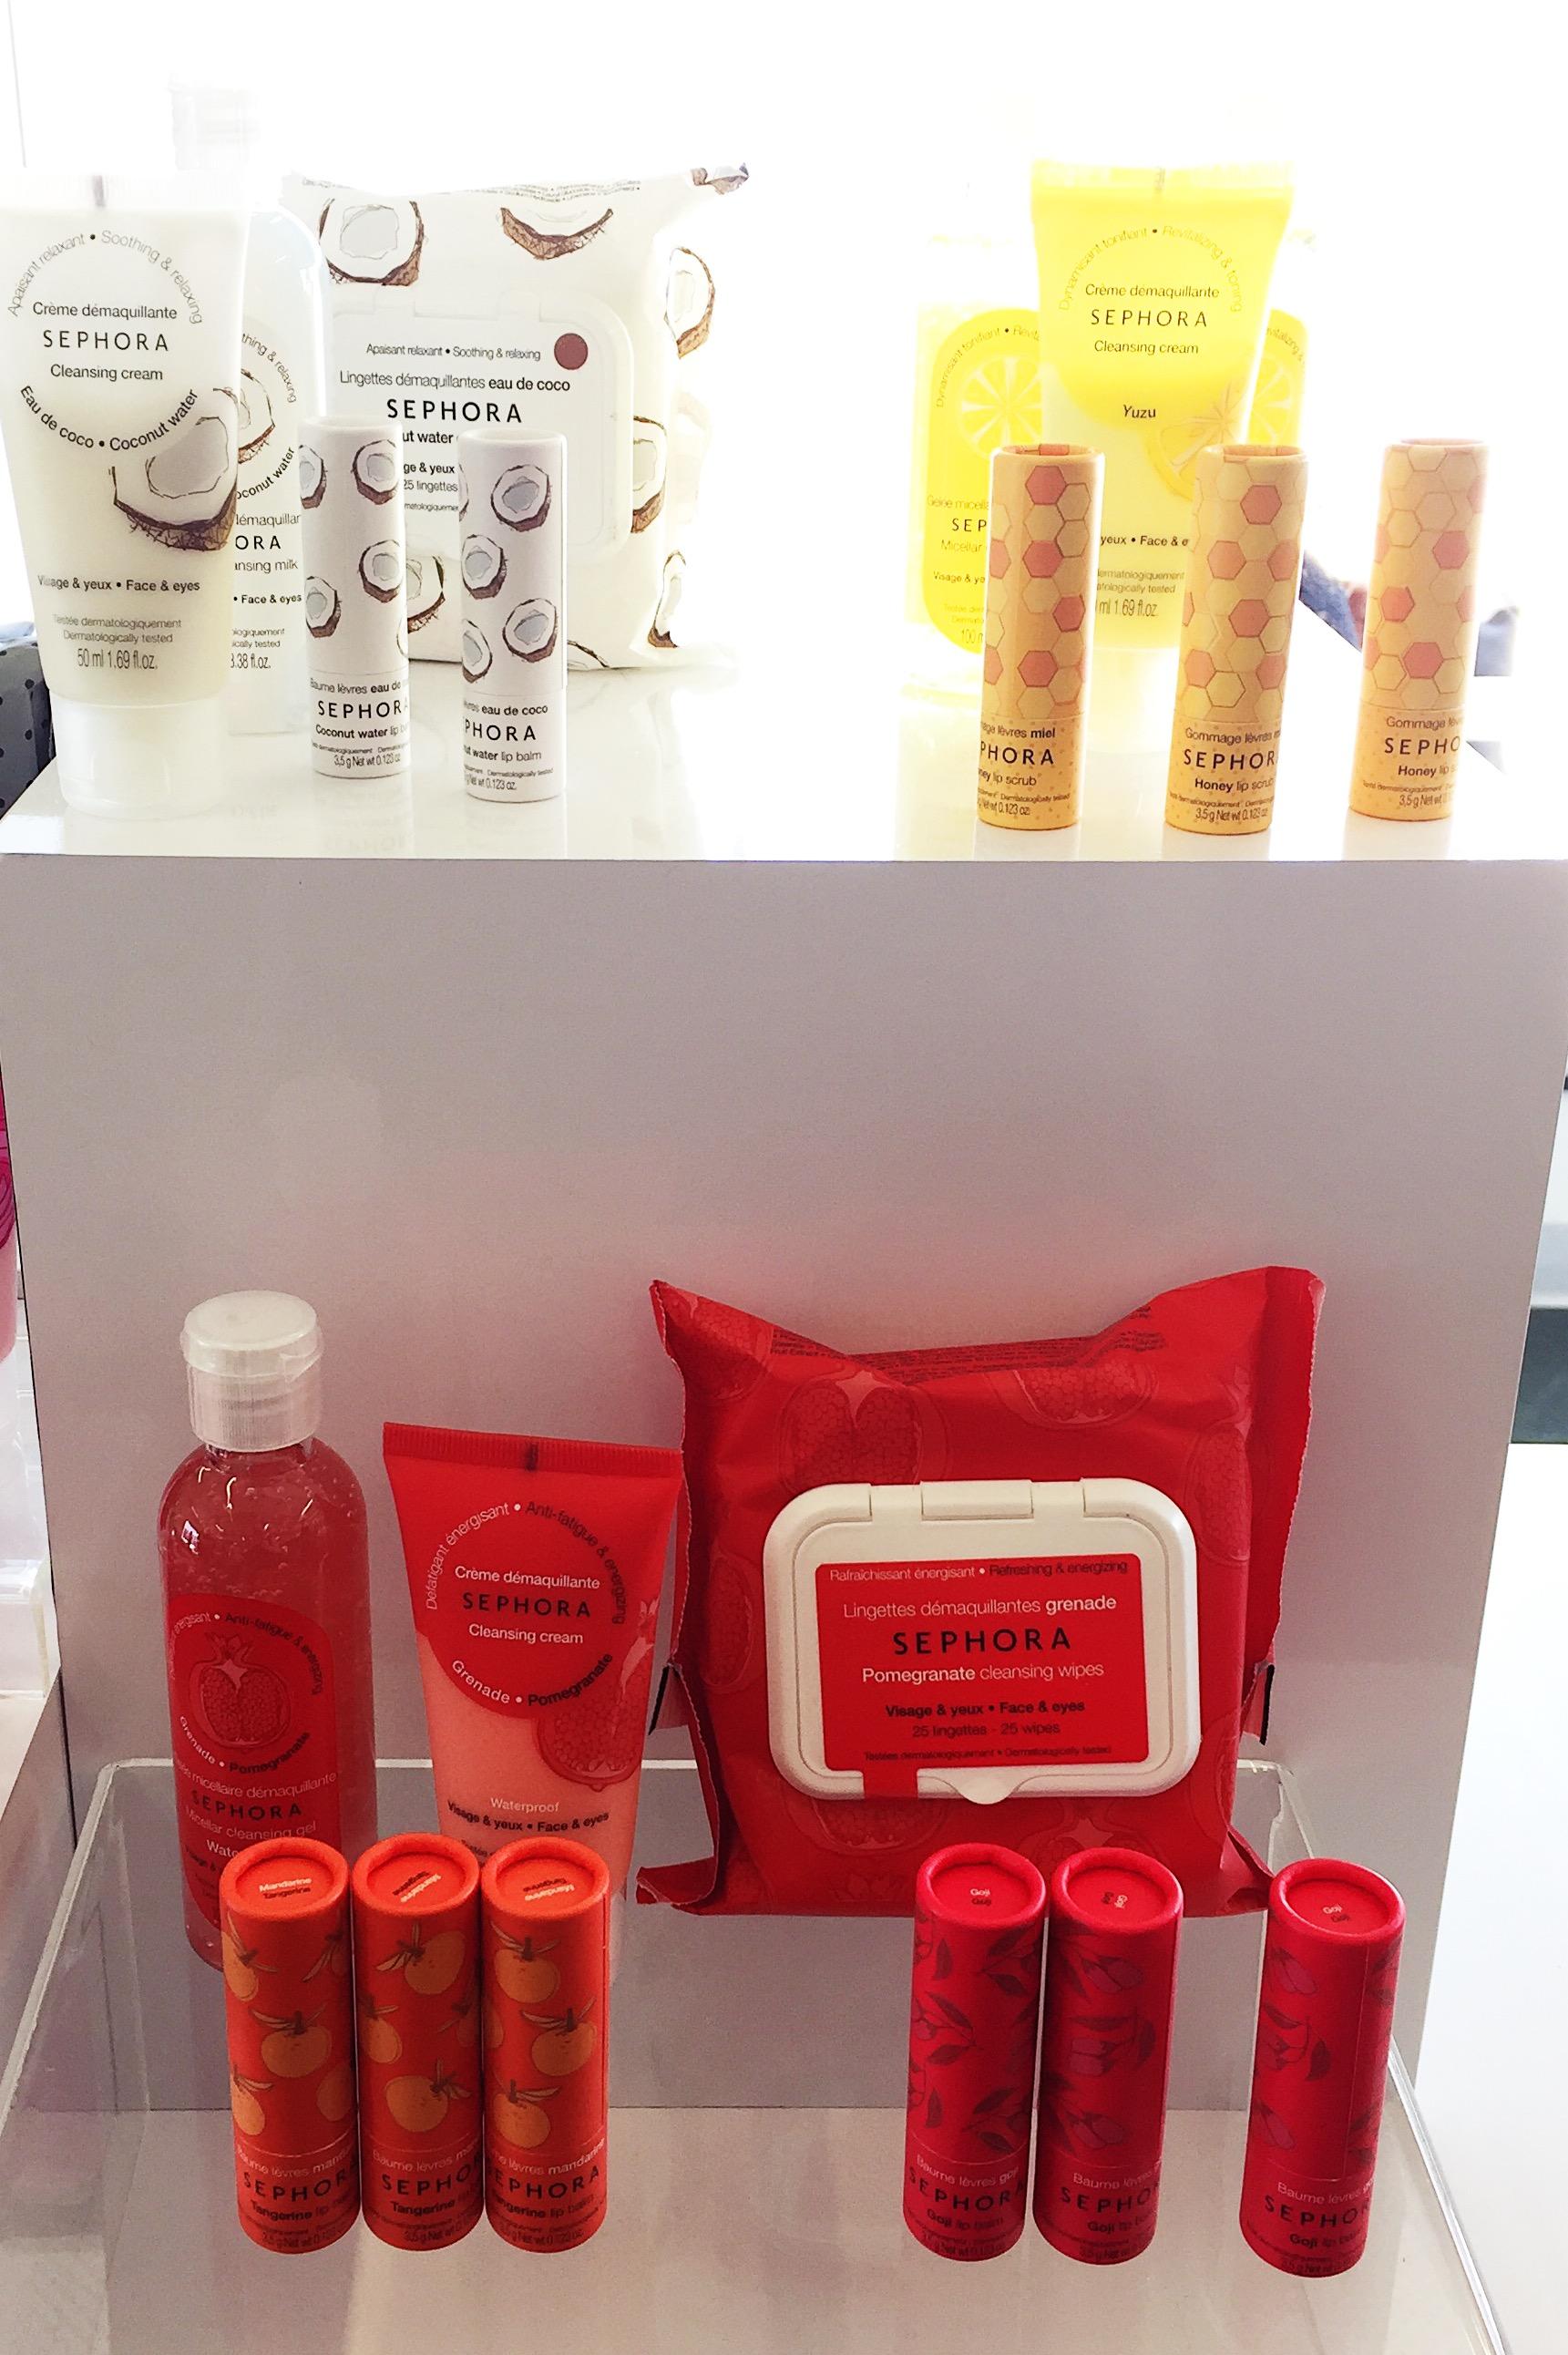 Marisa Robinson Beauty Blogger Sephora Exclusive Brands Showcase 2017